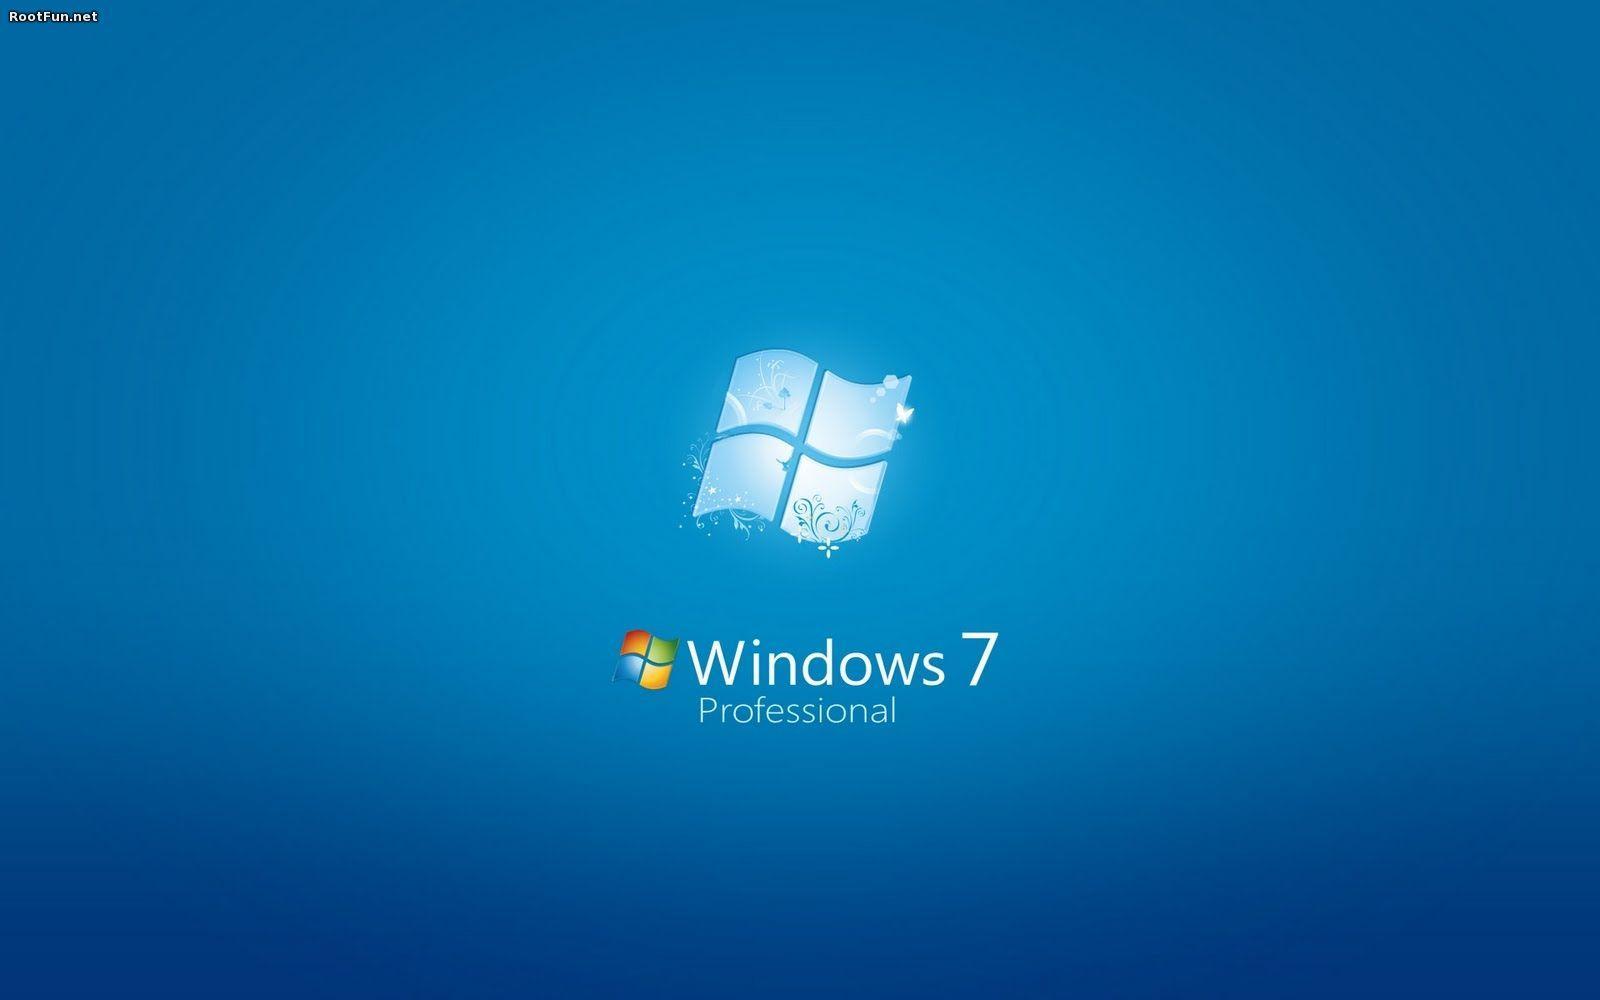 windows home screen wallpaper - photo #13